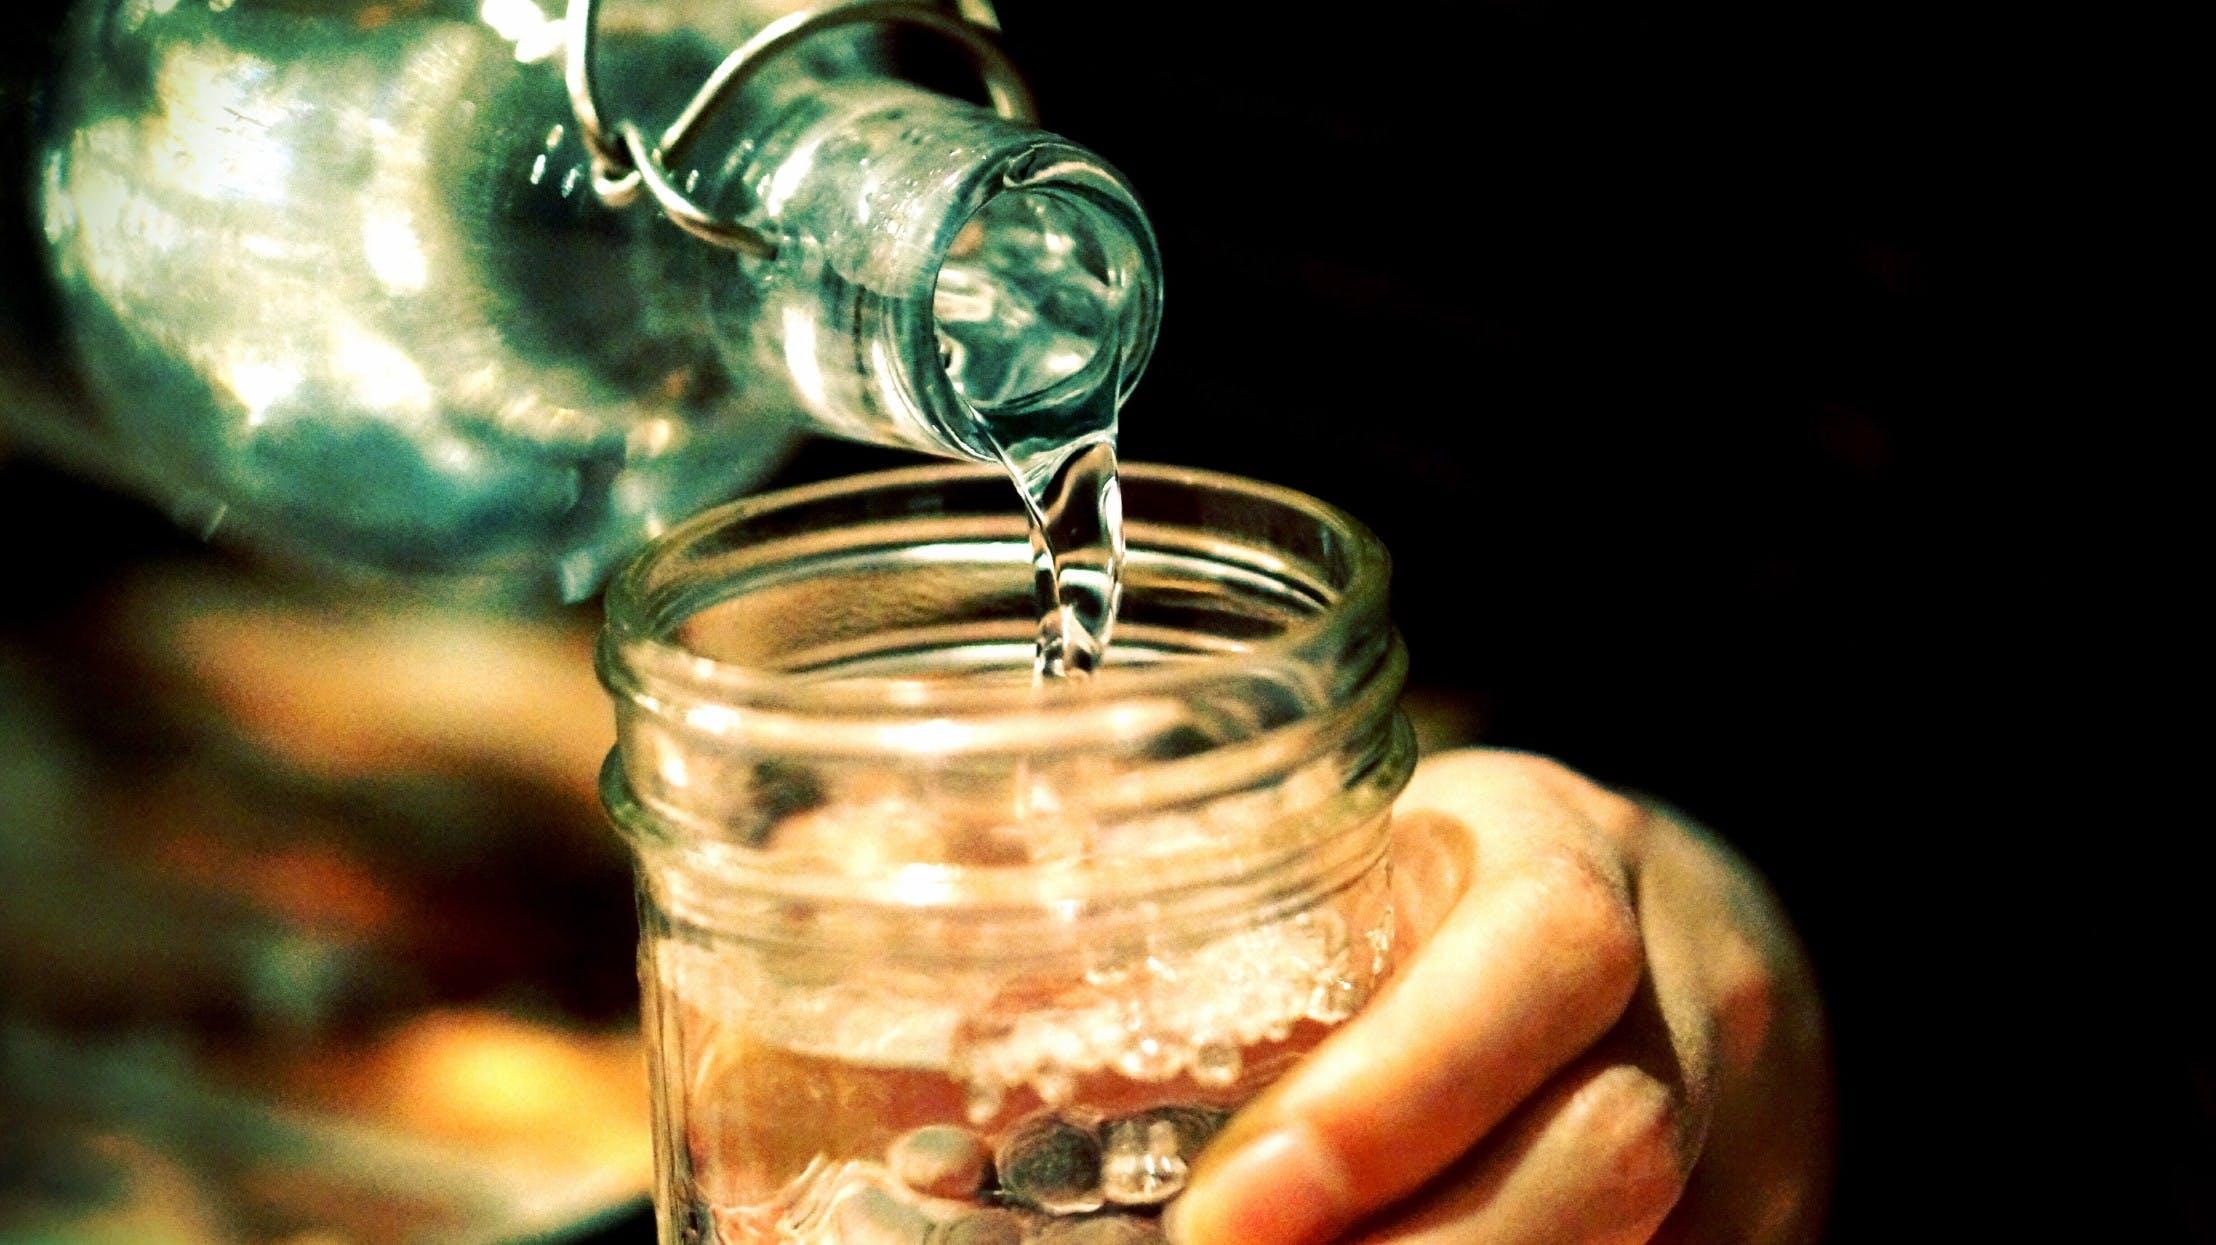 drink water chi soft winter skin 11.4